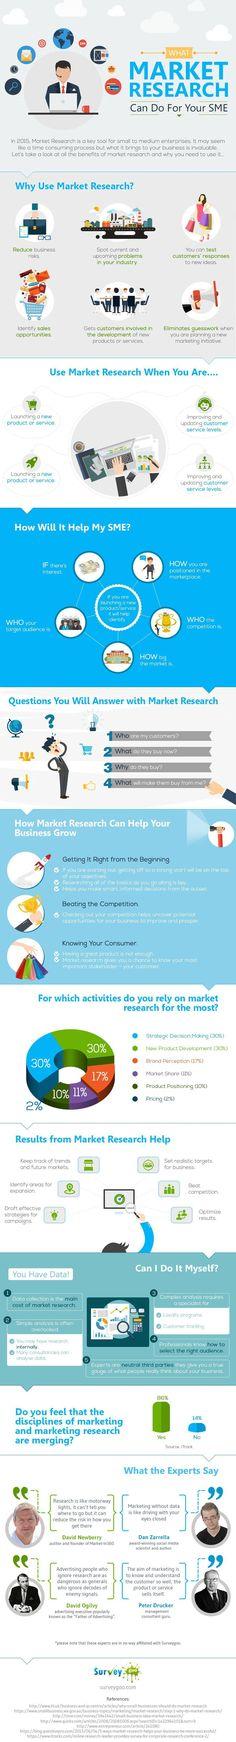 Integrated Marketing Communications Digital Mkg Tips \ Case - advertising plan template